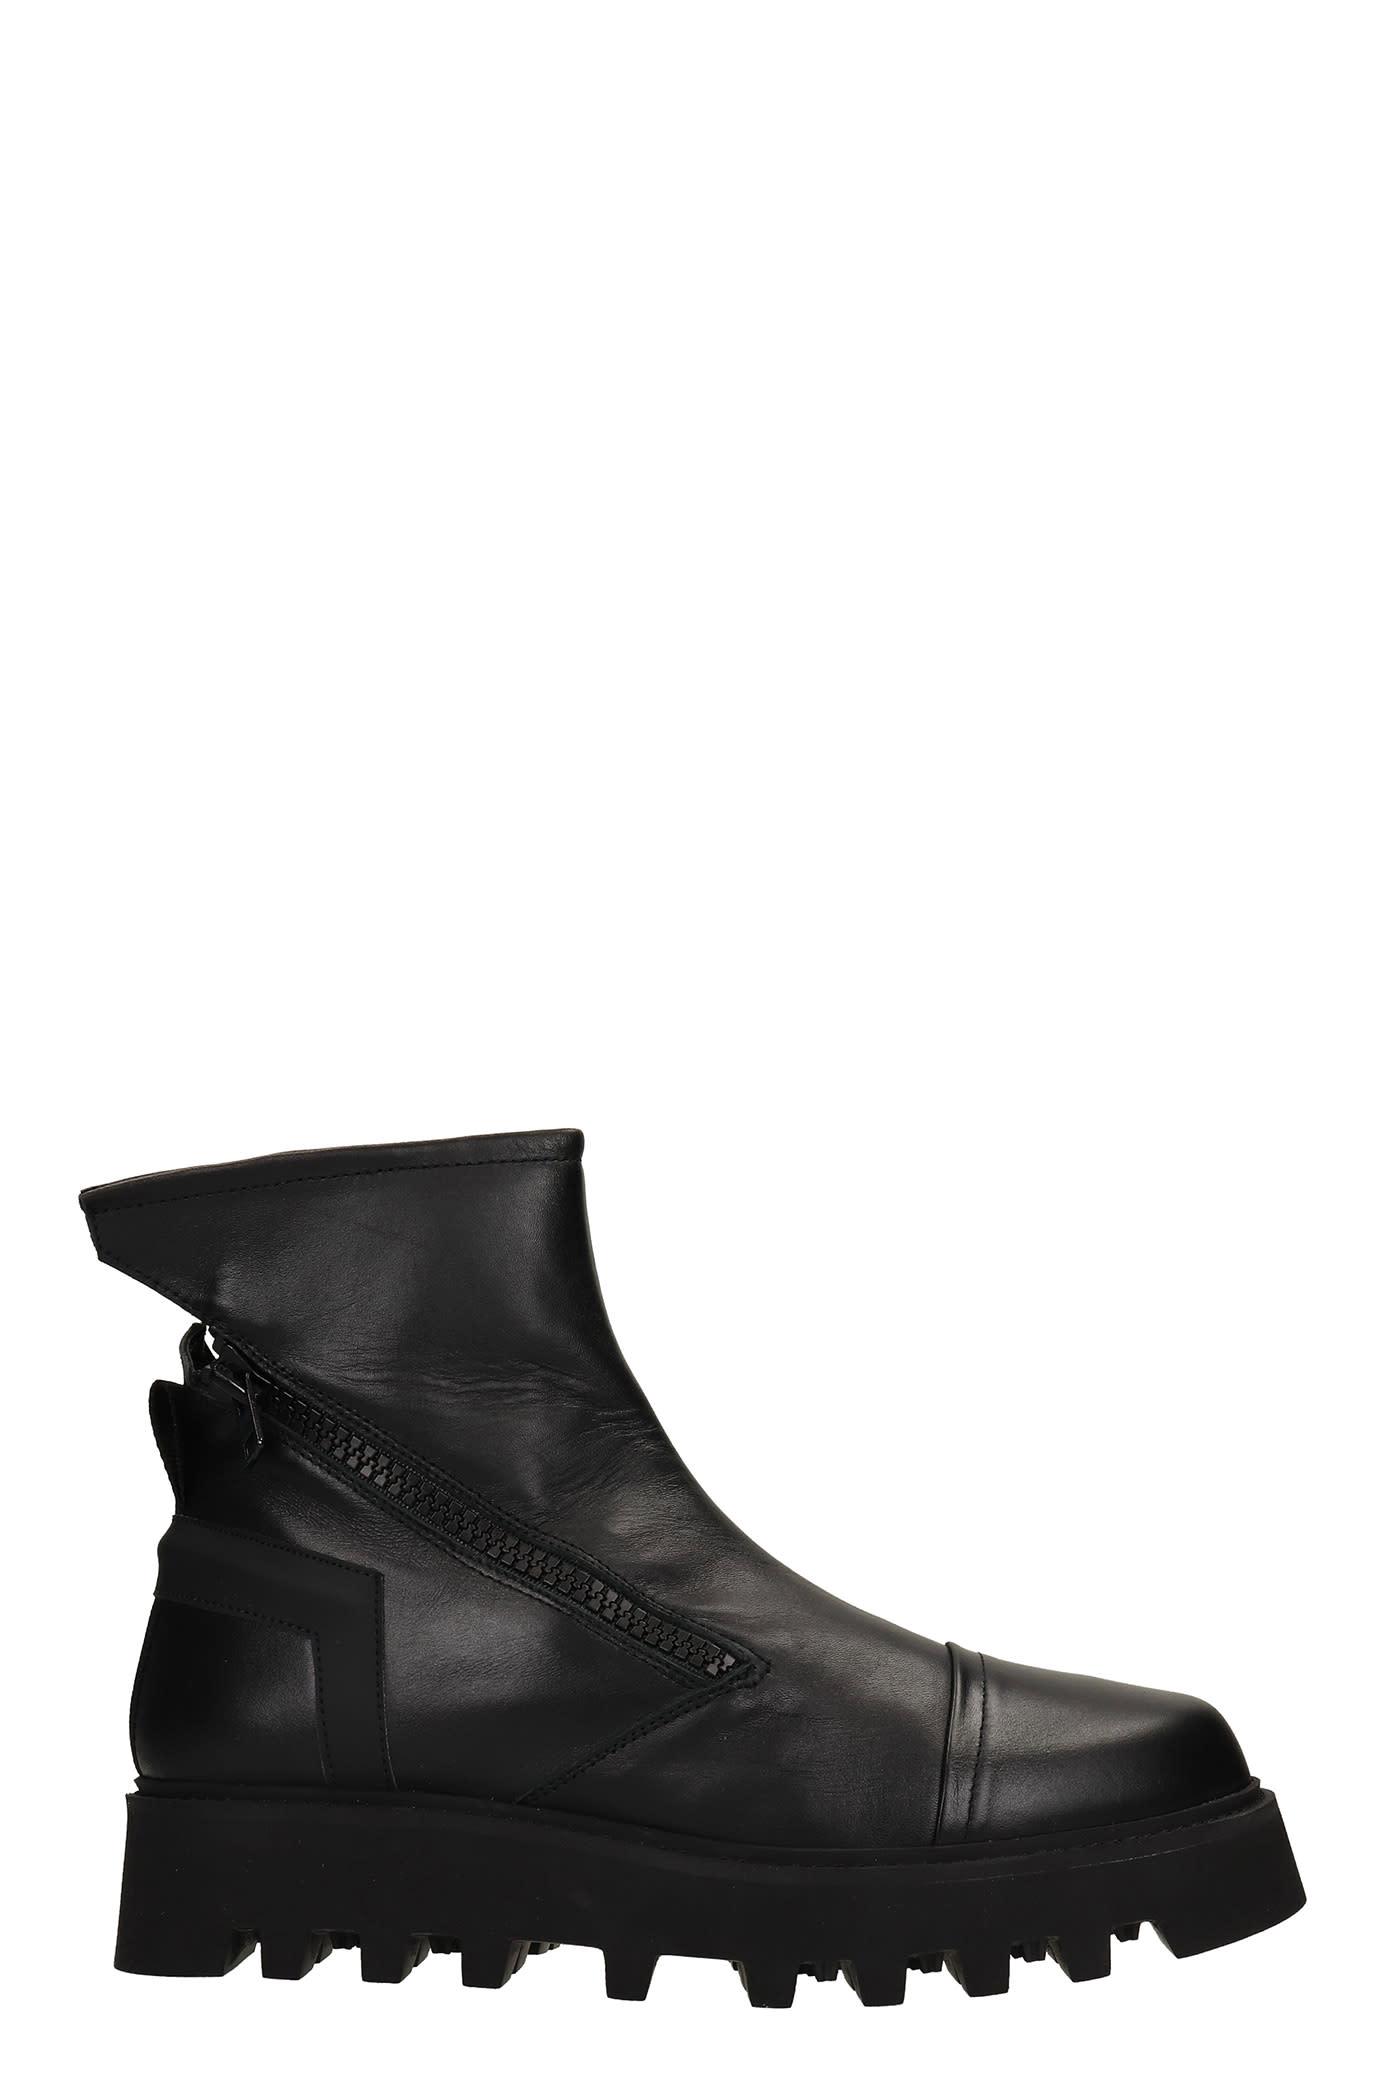 Pontiak Combat Boots In Black Leather